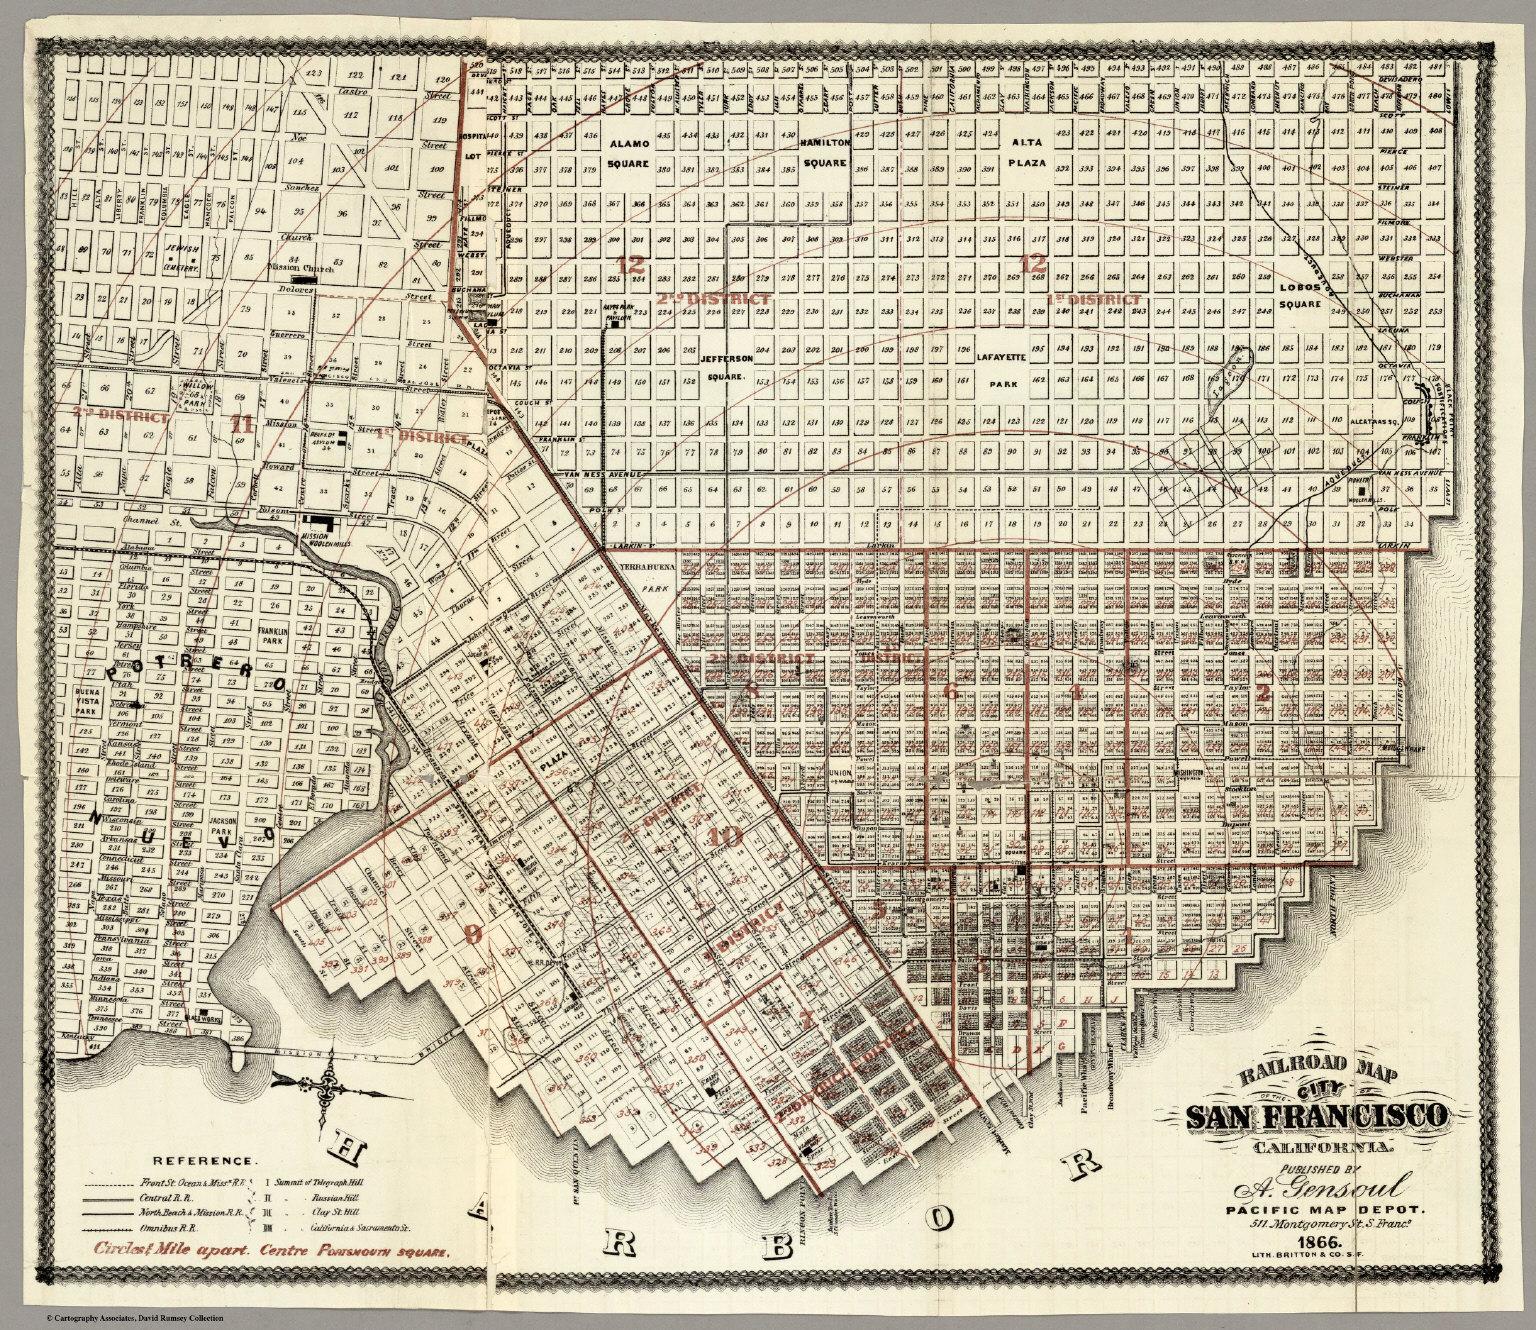 Railroad Map Of The City Of San Francisco California 1866 David